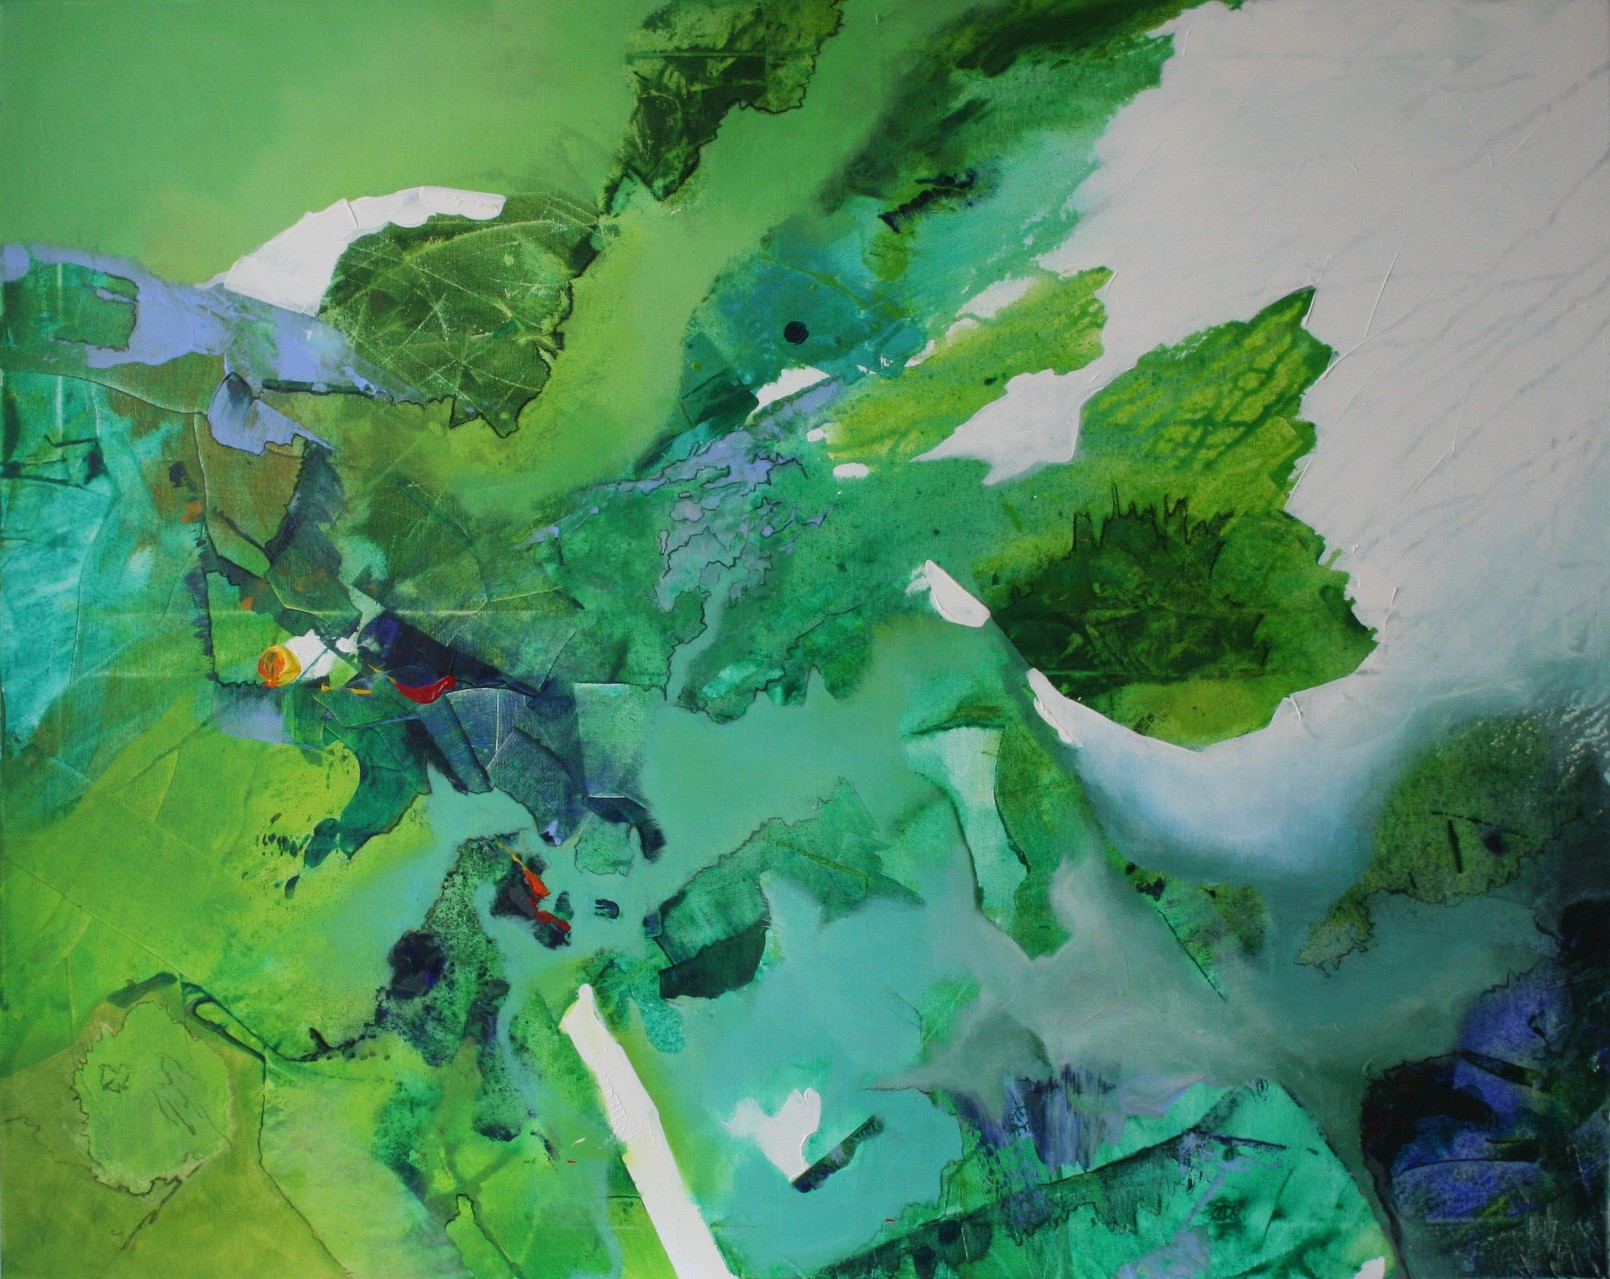 Grünes Gedankenmeer, Acryl auf Leinwand, 100 x 80 cm